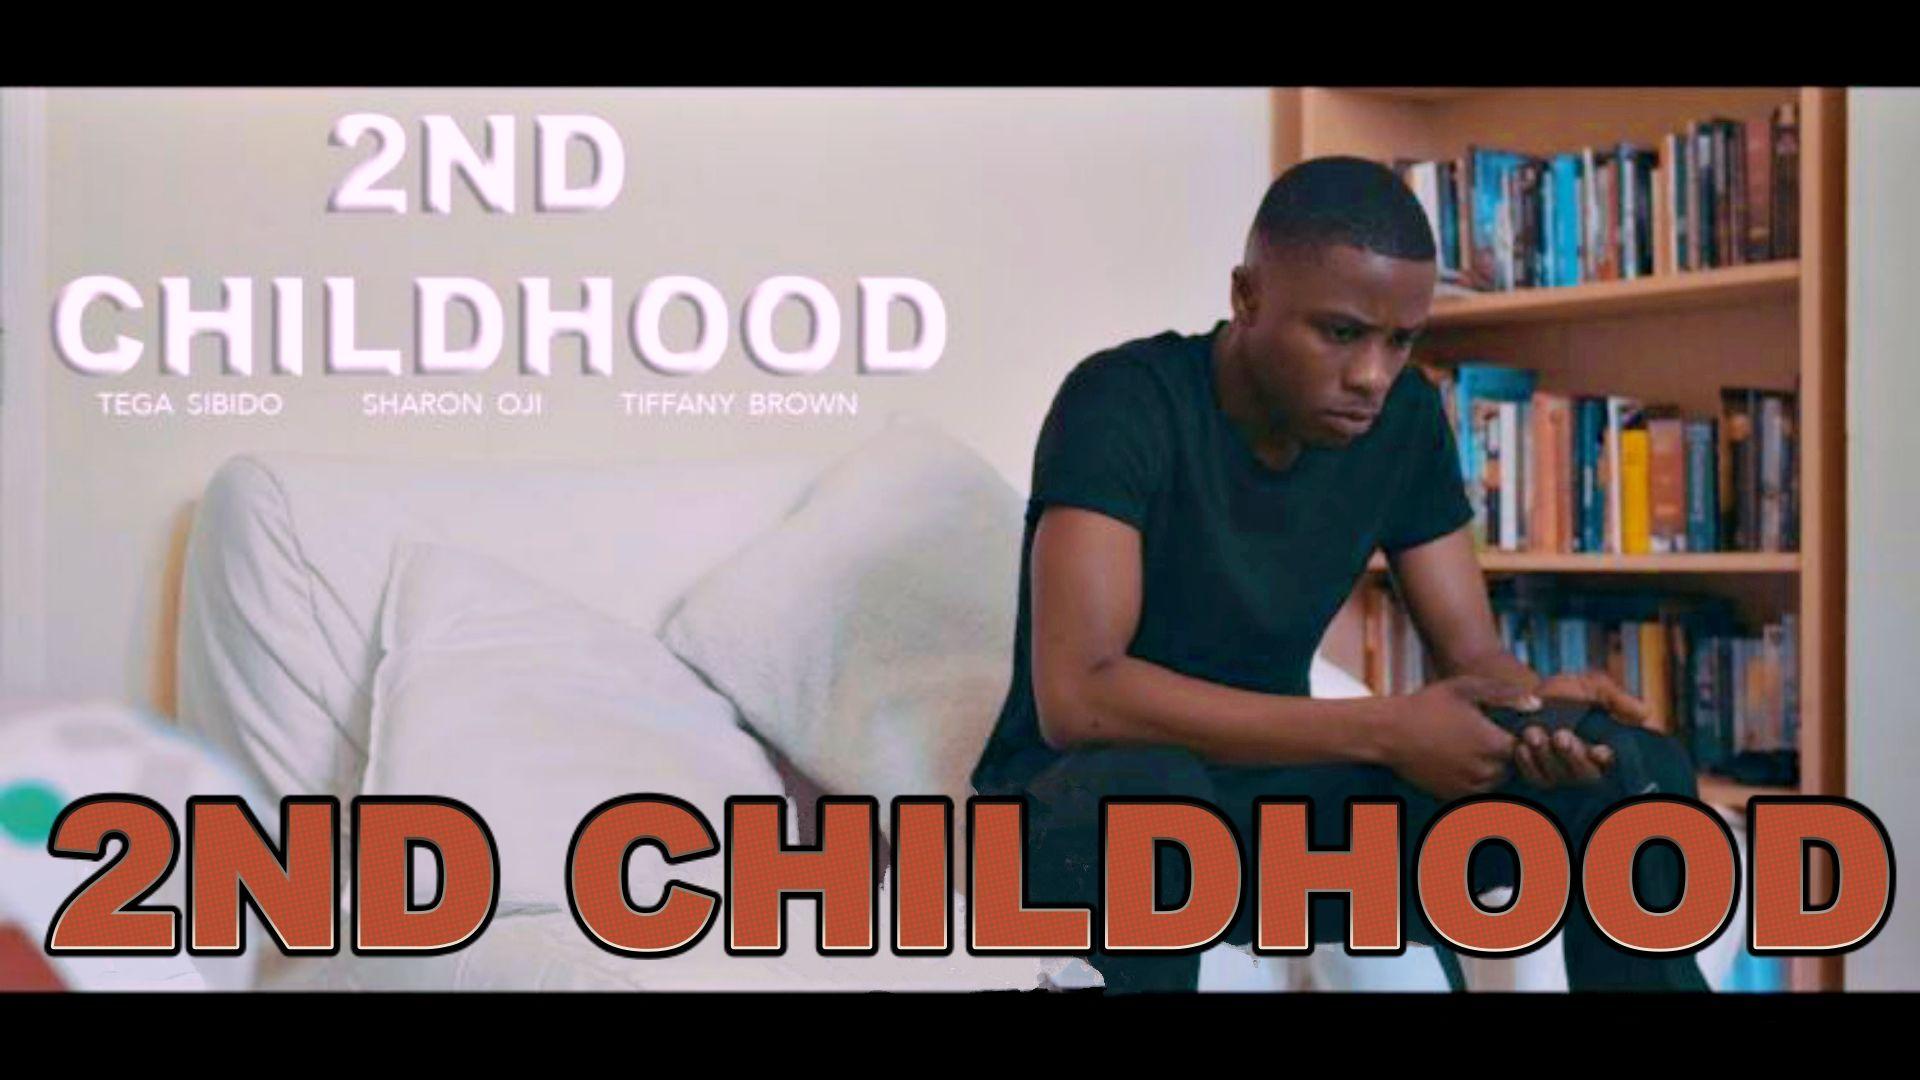 2nd Childhood